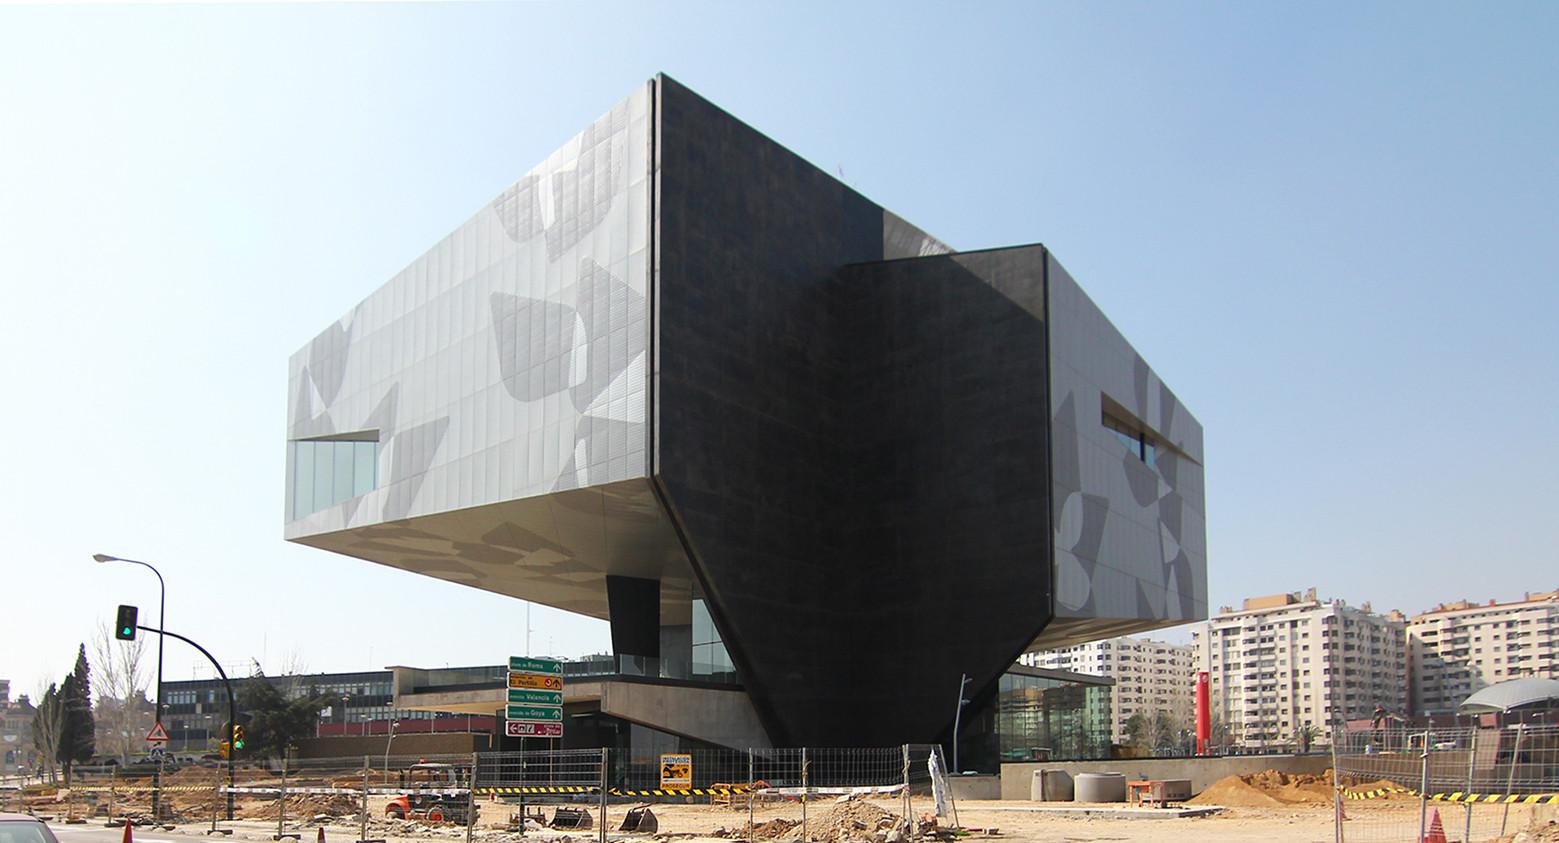 Gallery of caixaforum zaragoza estudio carme pinos 2 for Estudios arquitectura zaragoza